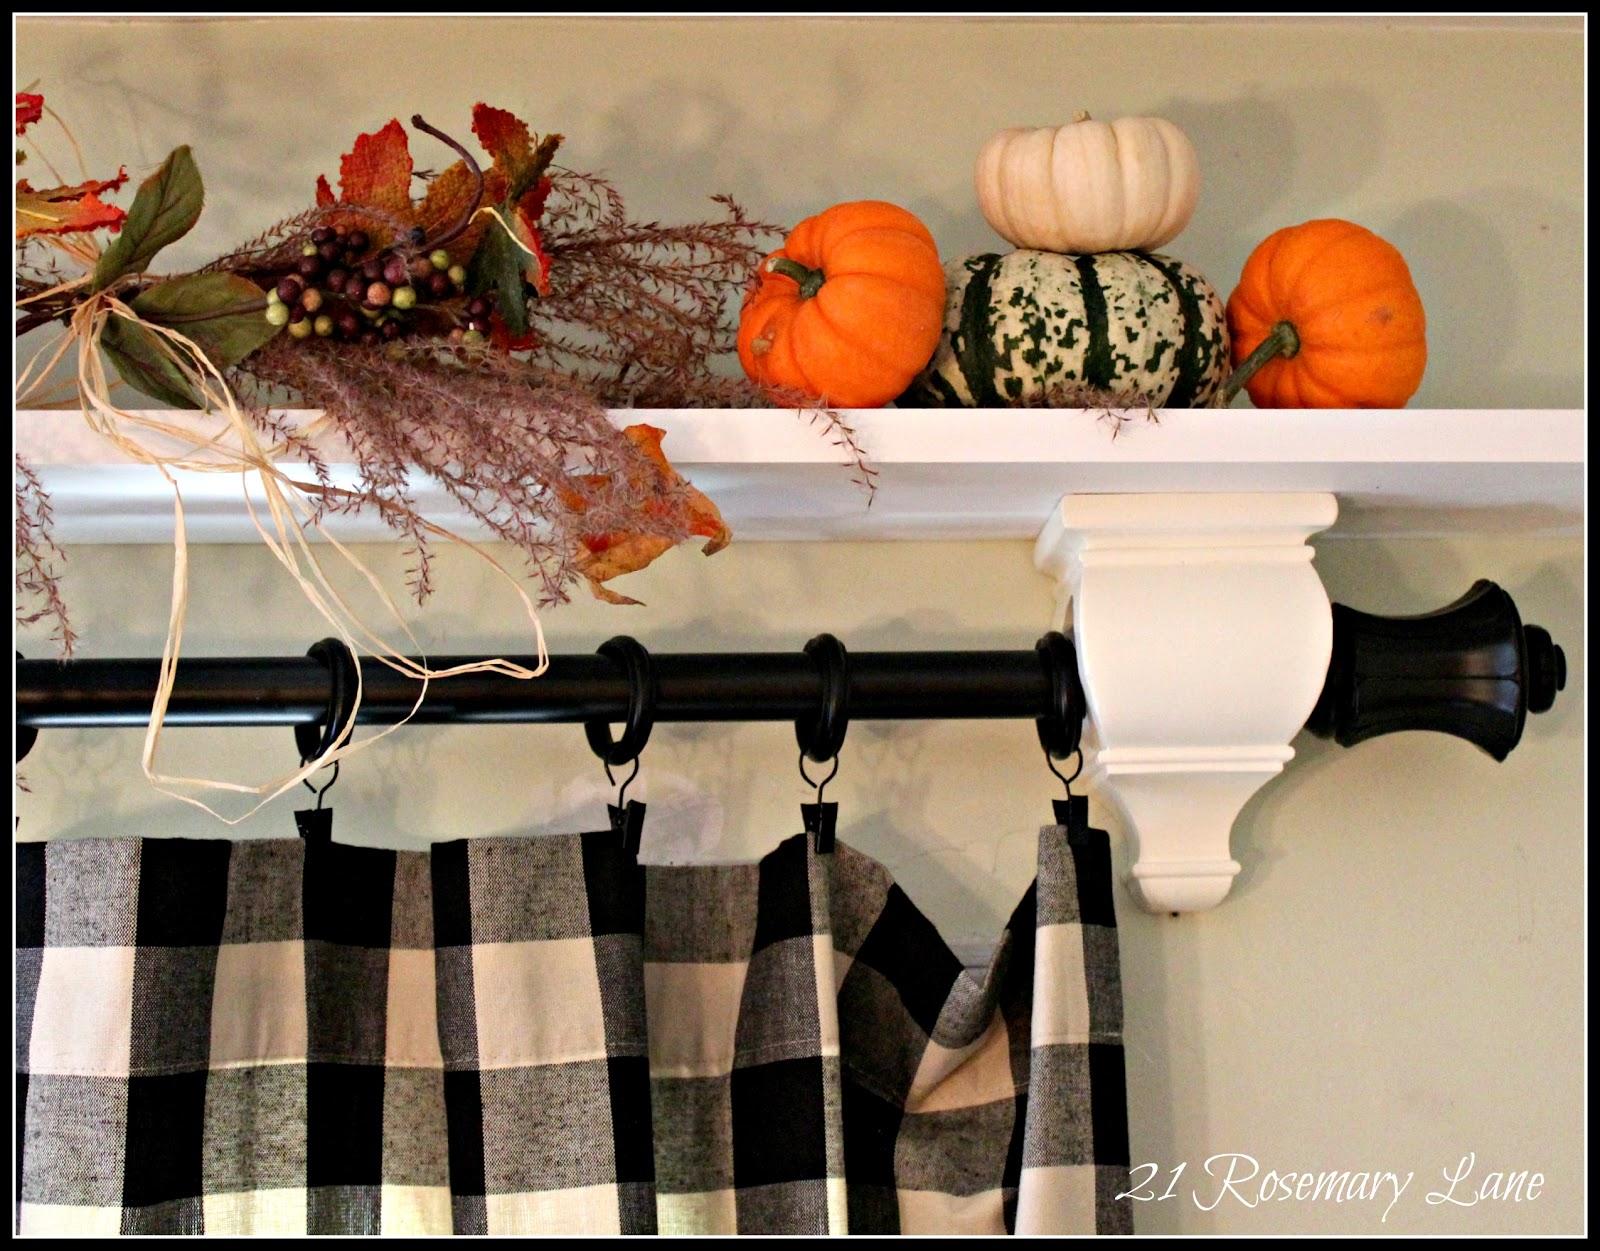 21 Rosemary Lane: Easy + Decorative Over